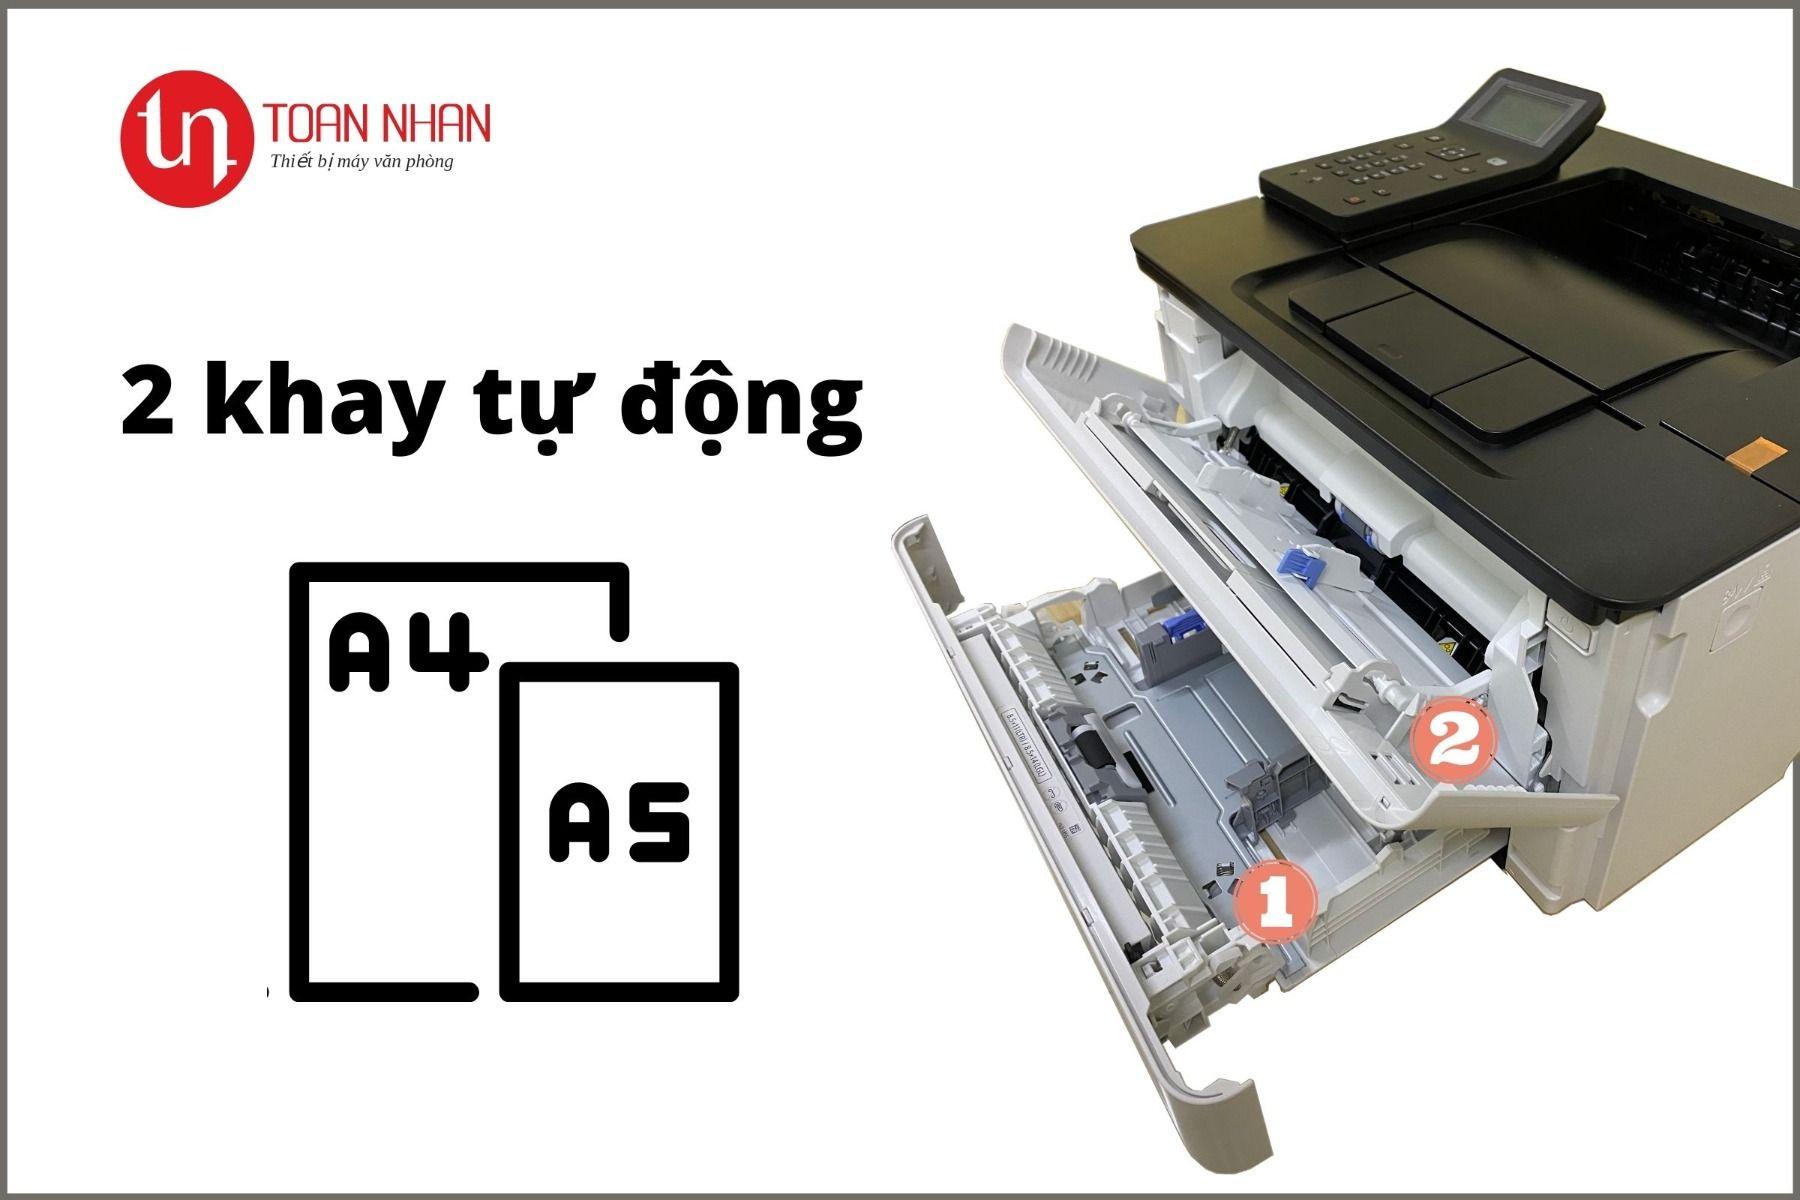 canon-223dw-2-khay-1